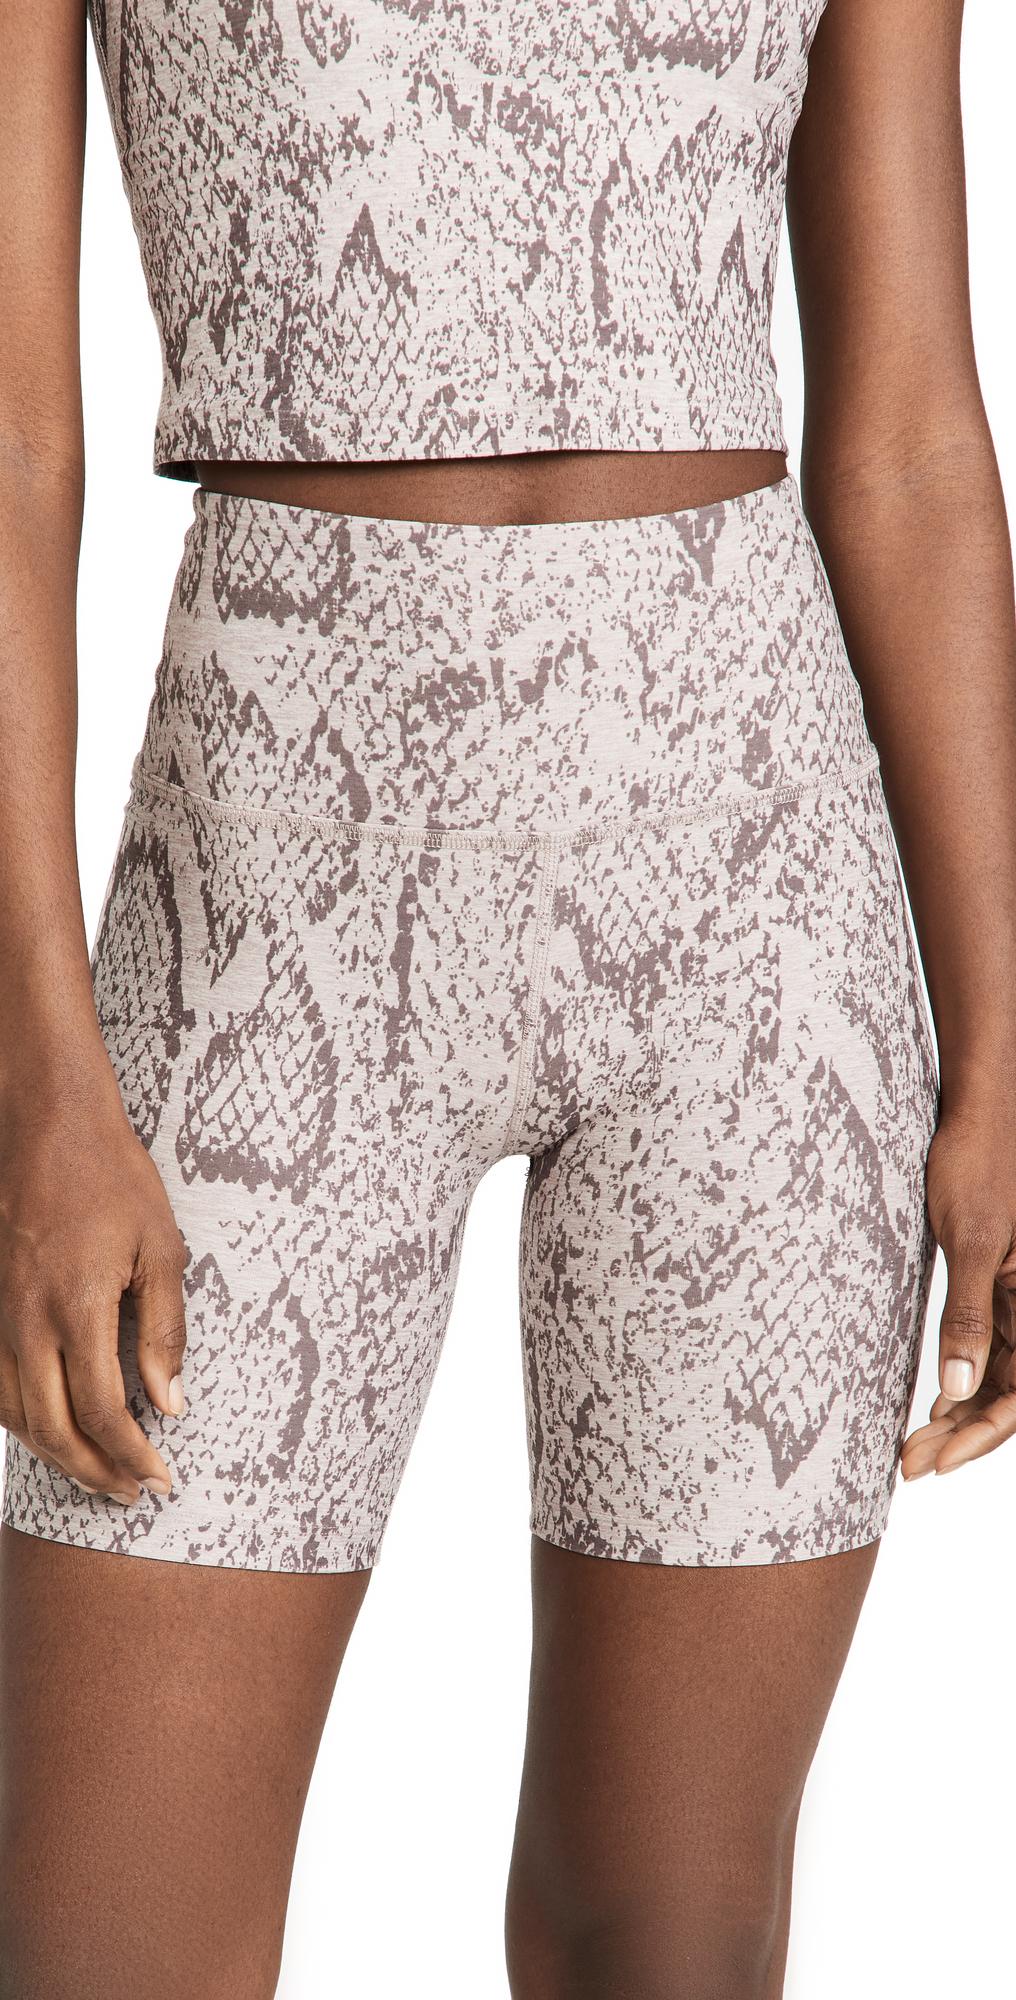 Beyond Yoga Spacedye Printed High Waisted Biker Shorts